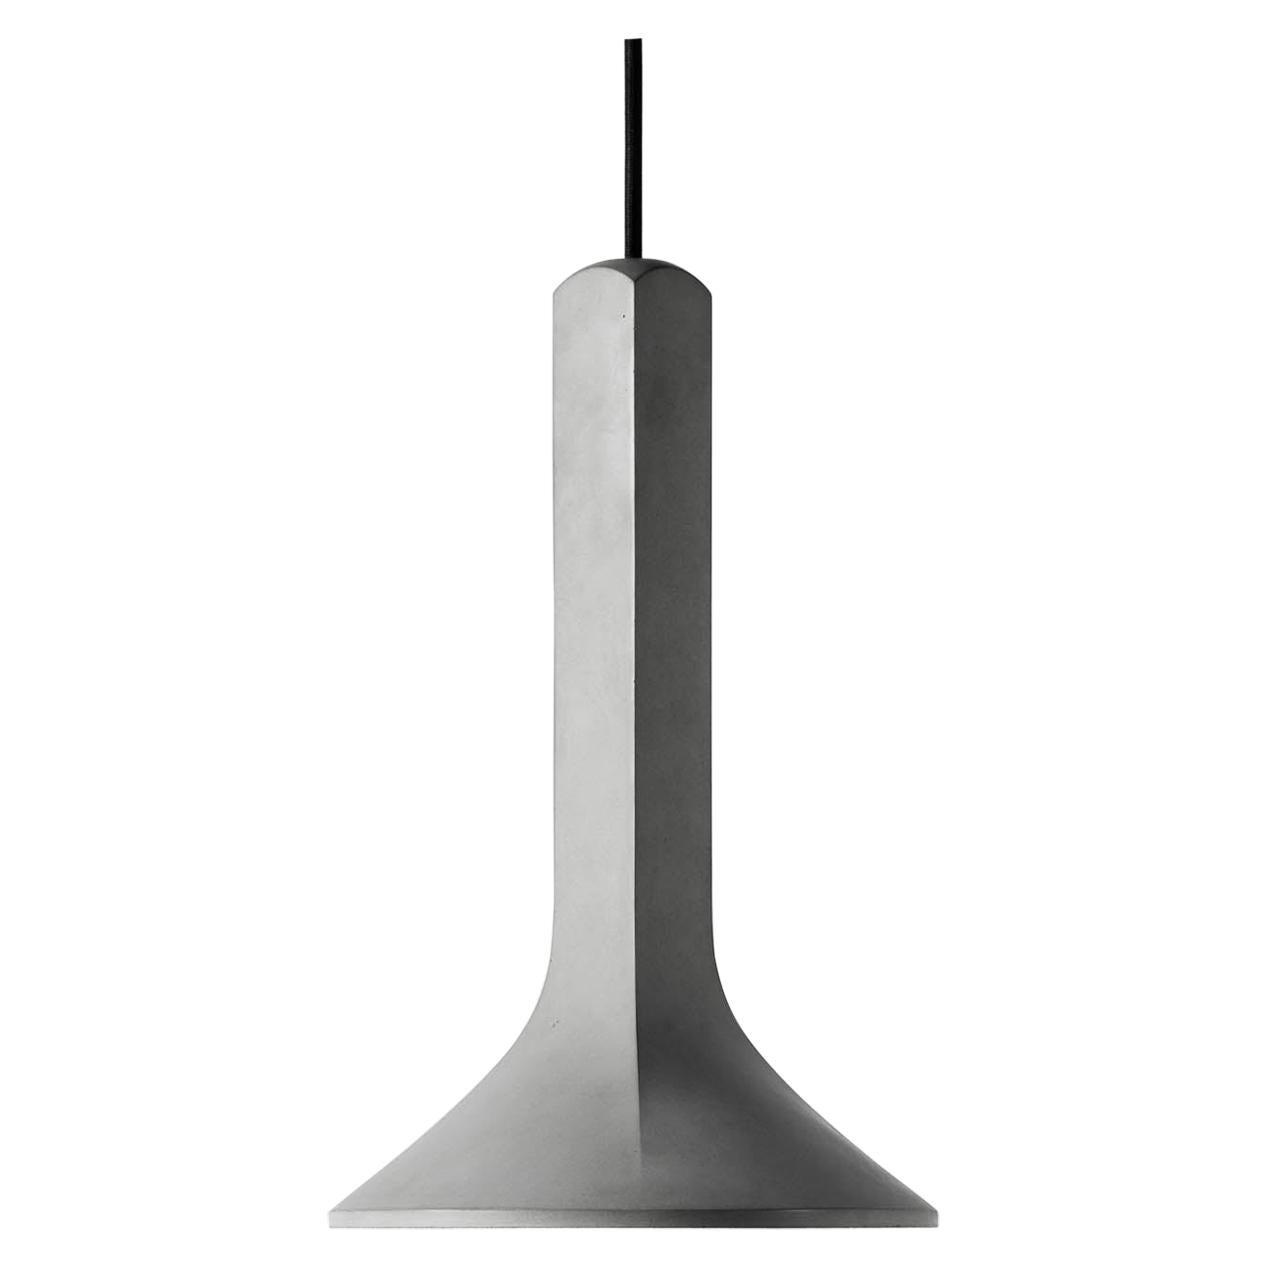 Concrete Pendant Lamp 'Chuan' by Bentu Design